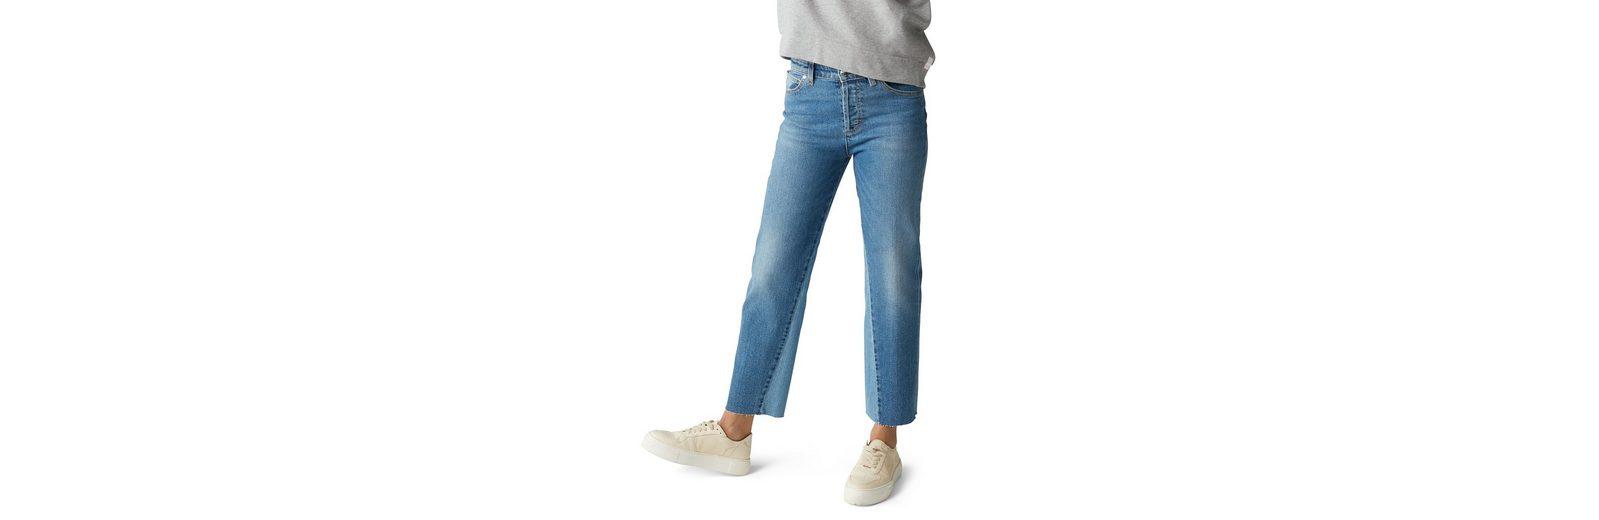 Marc O'Polo DENIM Gerade Jeans Footlocker Finish Verkauf Online bHbCwfZ0Jb